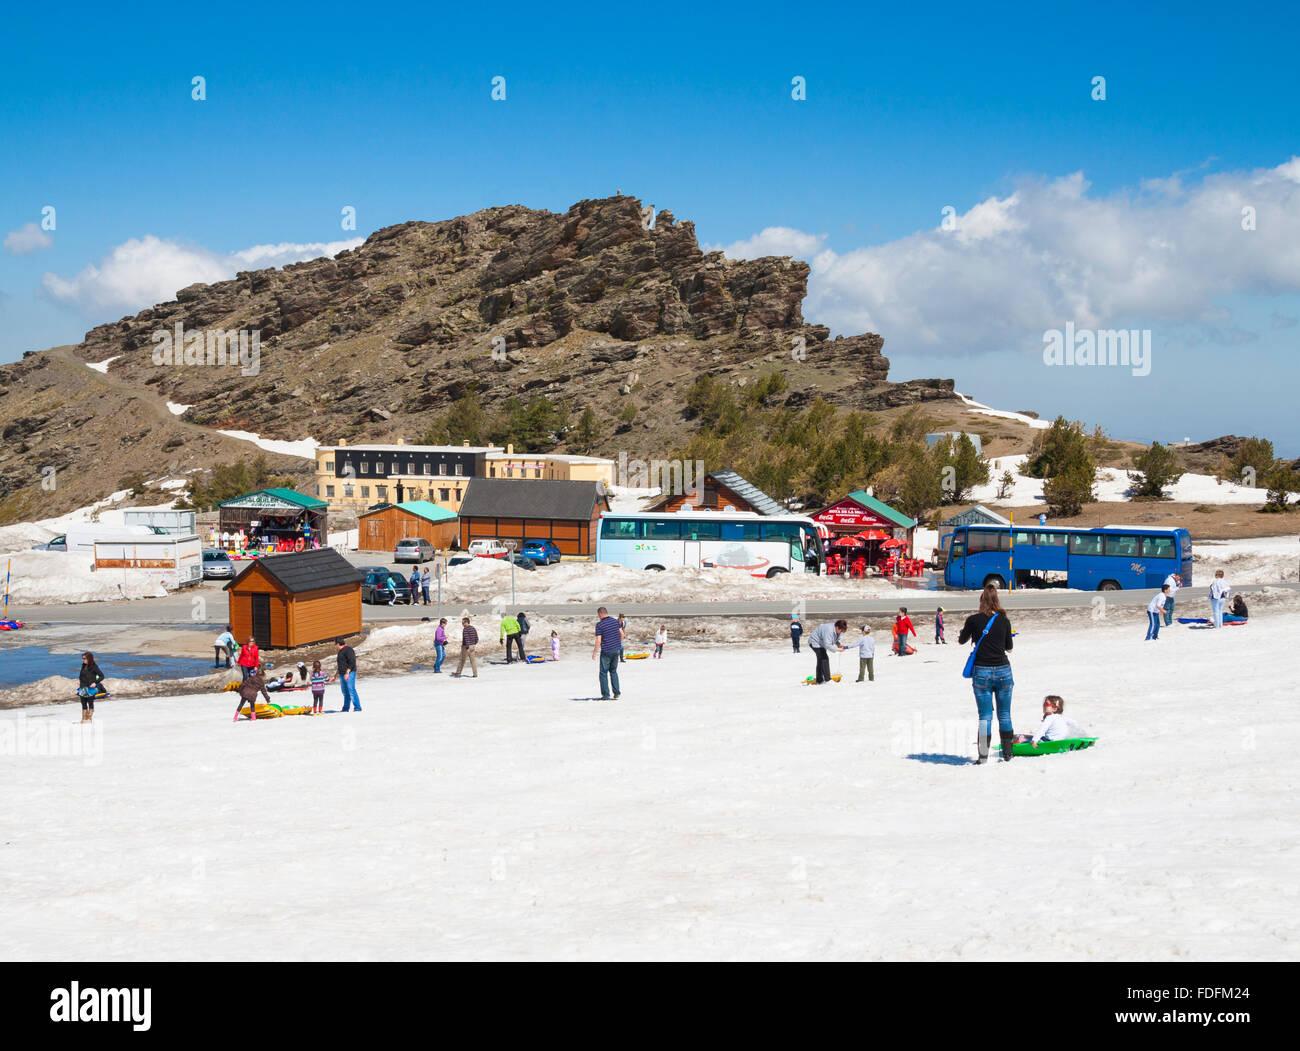 Ski resort Pradollano near Granada in the Sierra Nevada mountains, Andalusia, Spain - Stock Image